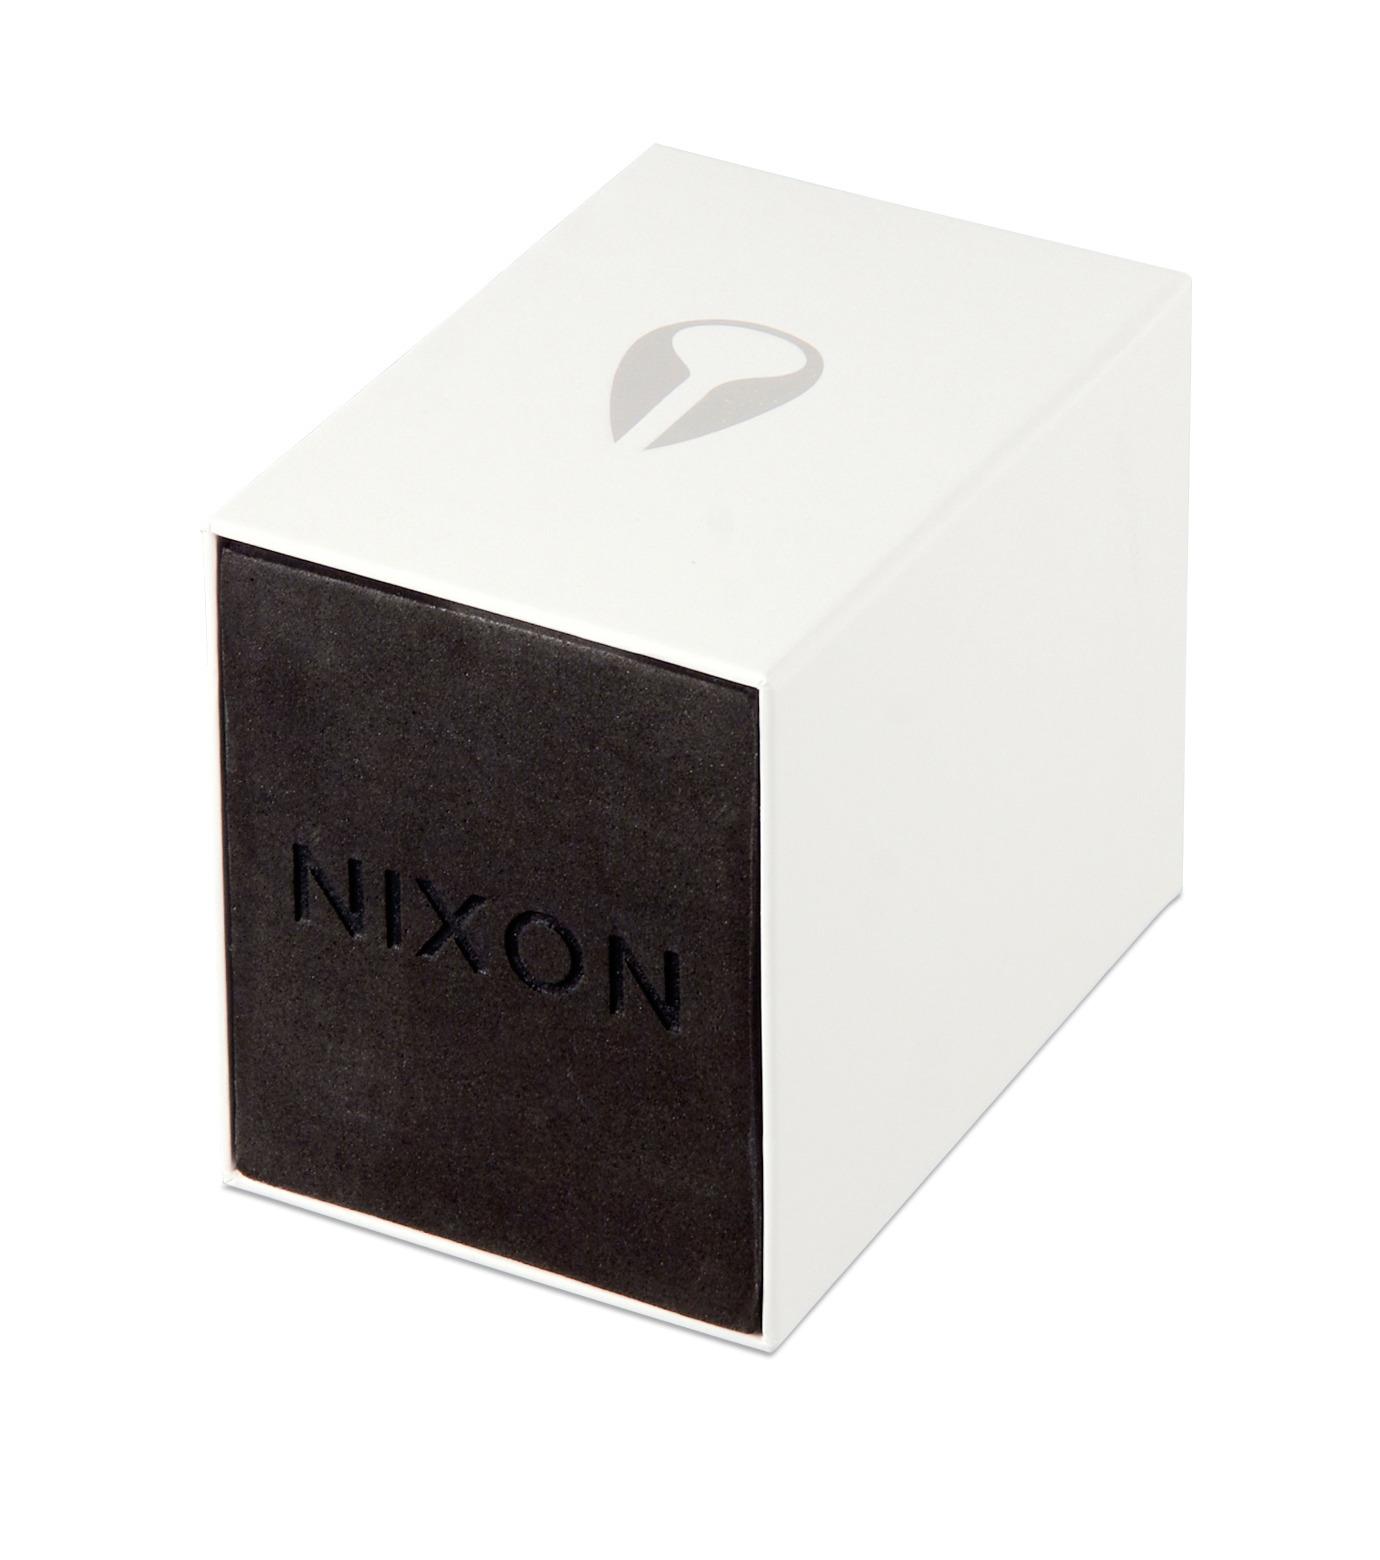 Nixon(ニクソン)のLodown2-KHAKI-NA5301266-00-24 拡大詳細画像3